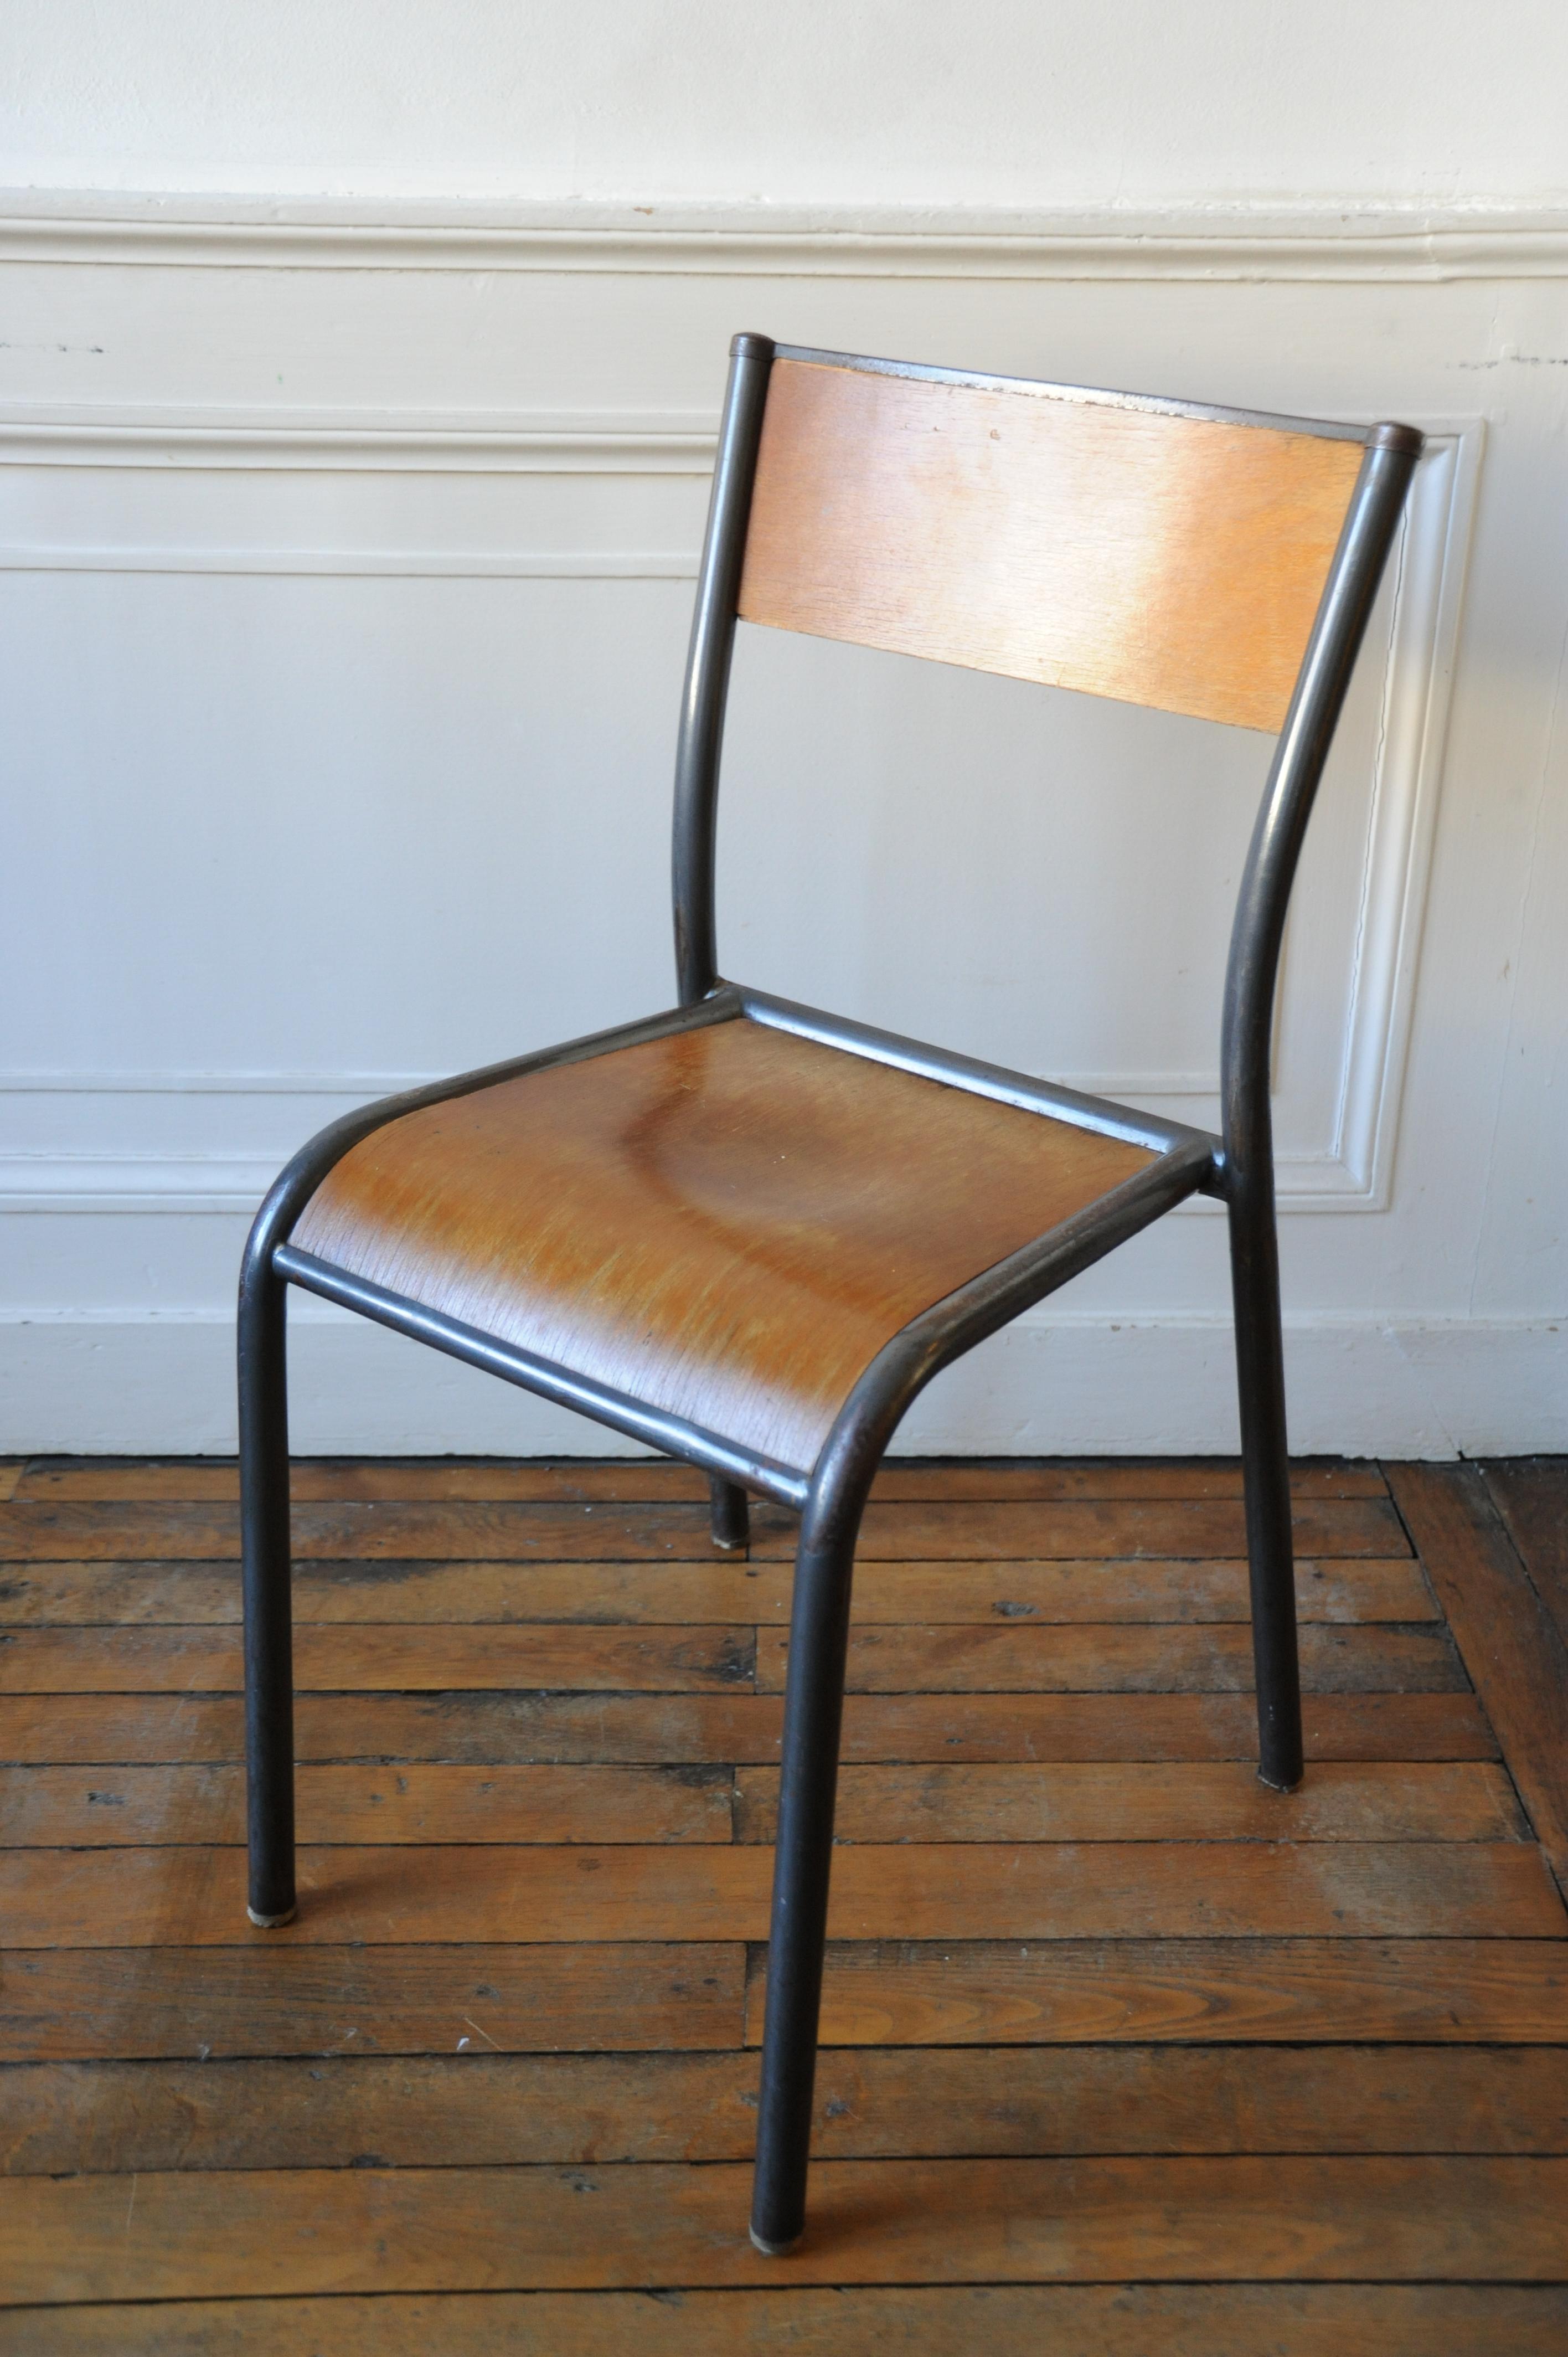 chaises mullca l 39 atelier de niguedouille. Black Bedroom Furniture Sets. Home Design Ideas